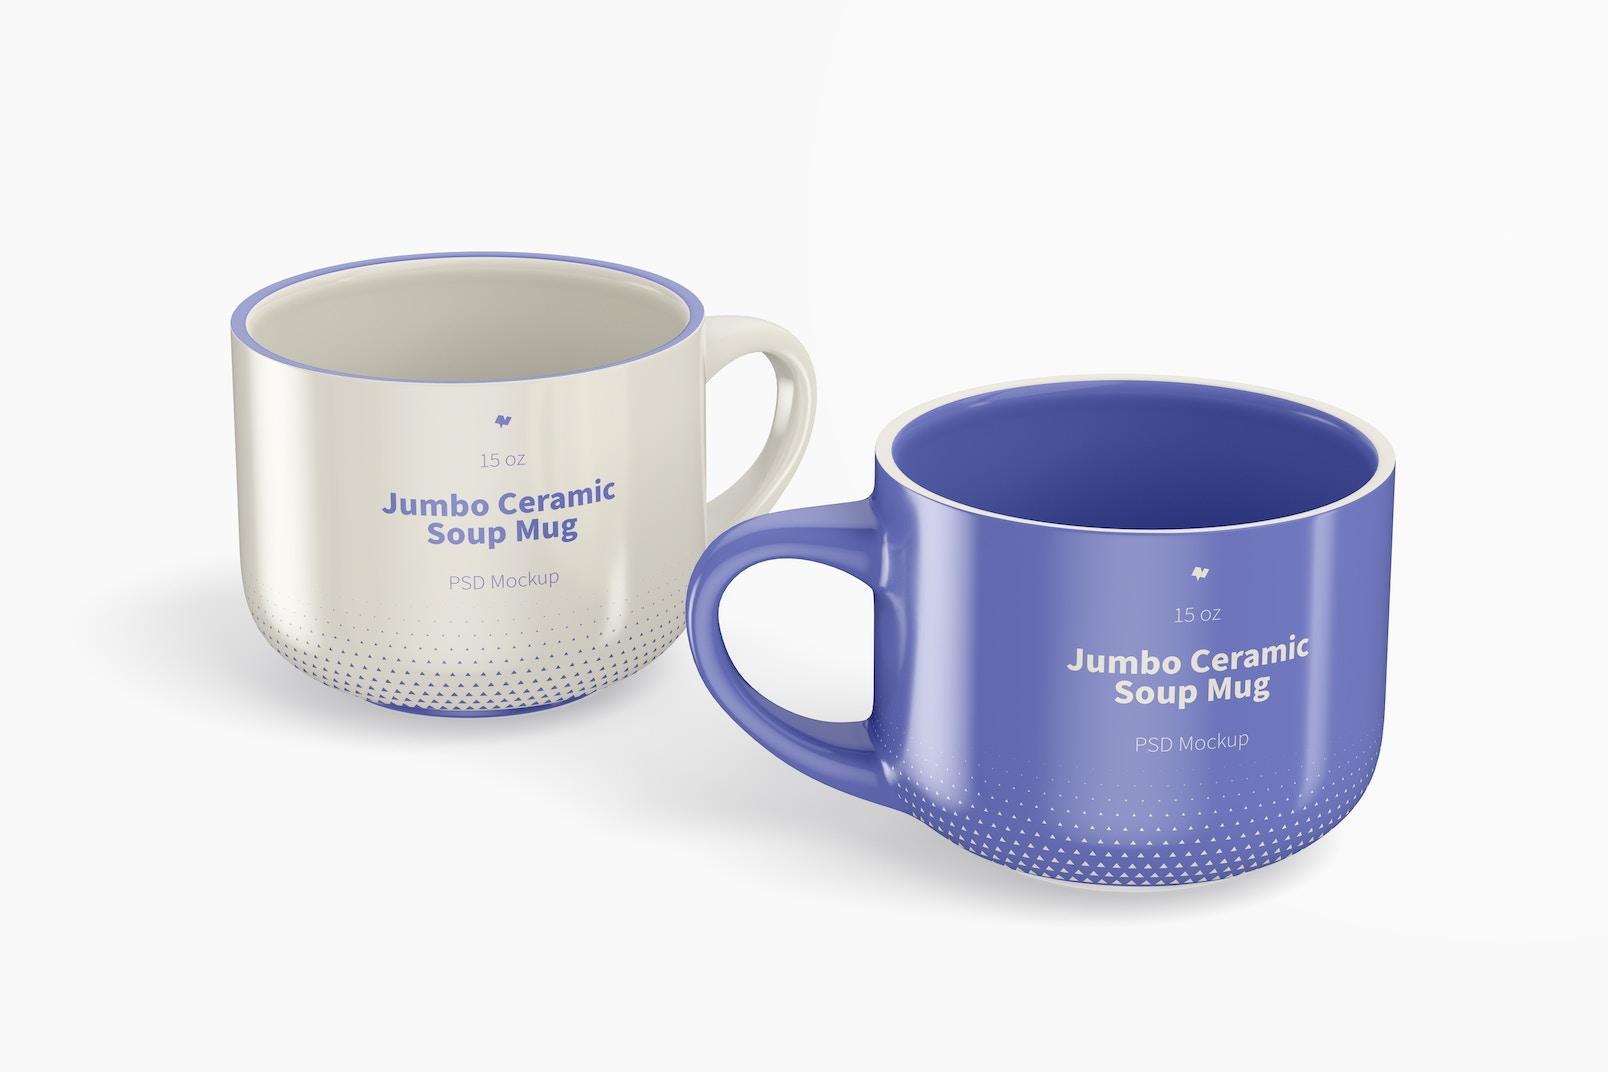 15 oz Jumbo Ceramic Soup Mugs Mockup, Front View